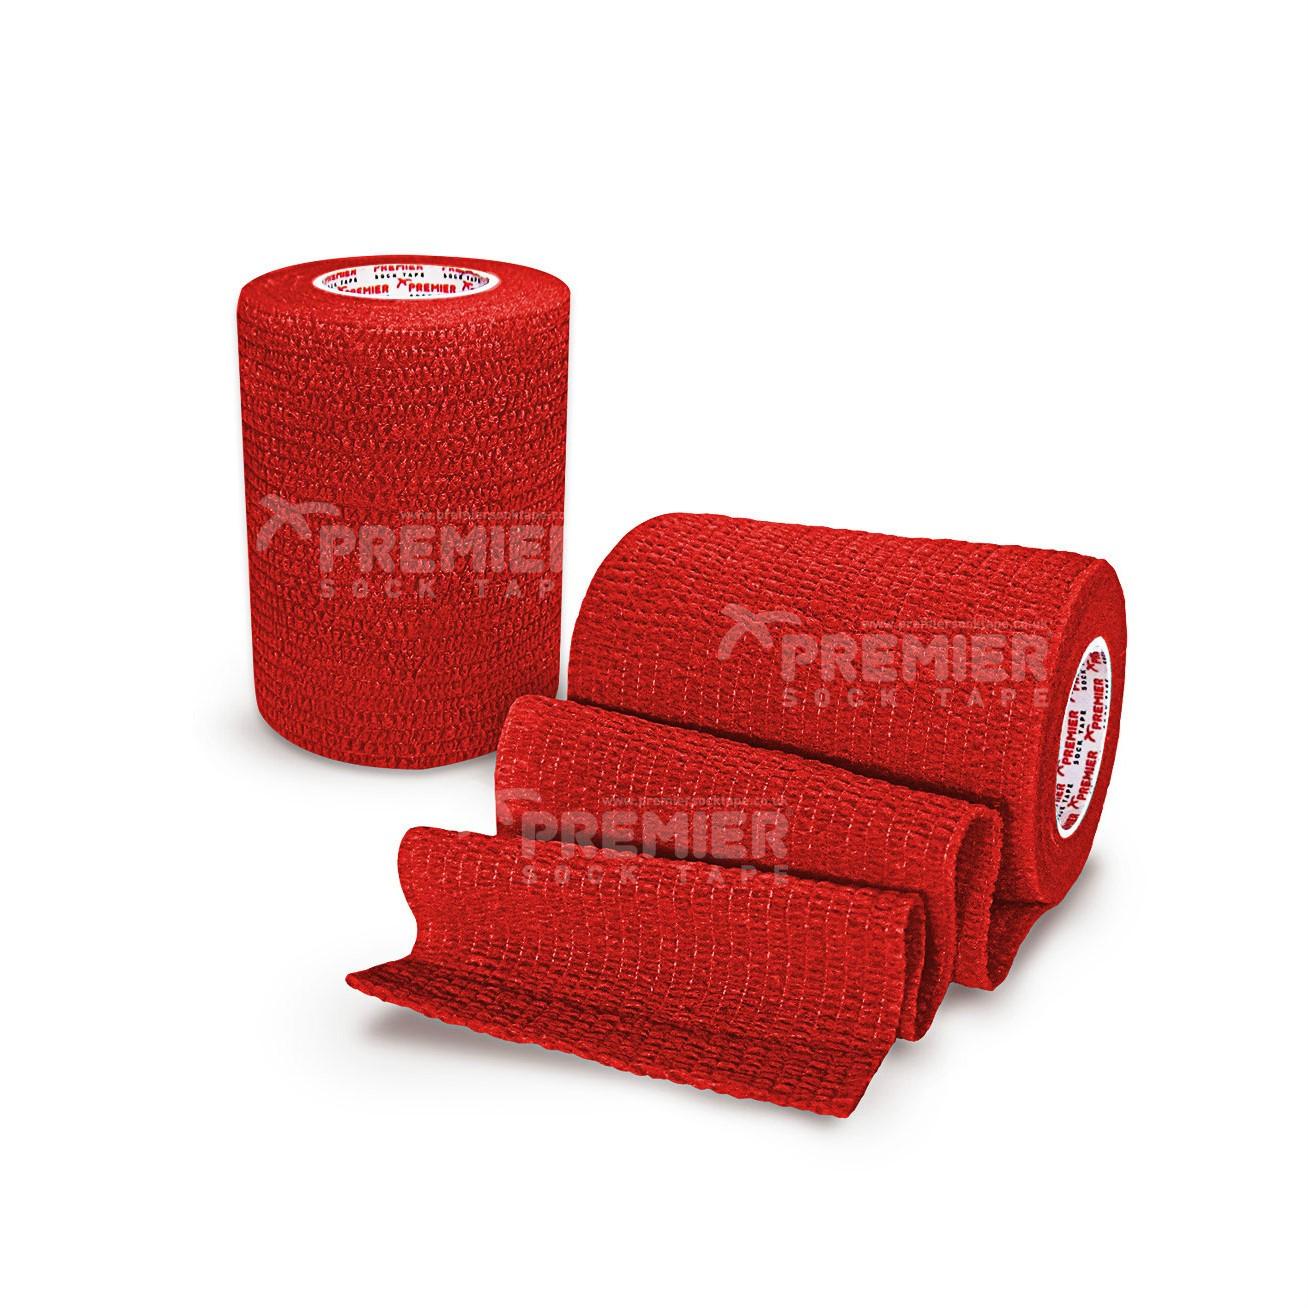 Premier Sock Tape Pro-Wrap 7.5cm - Red